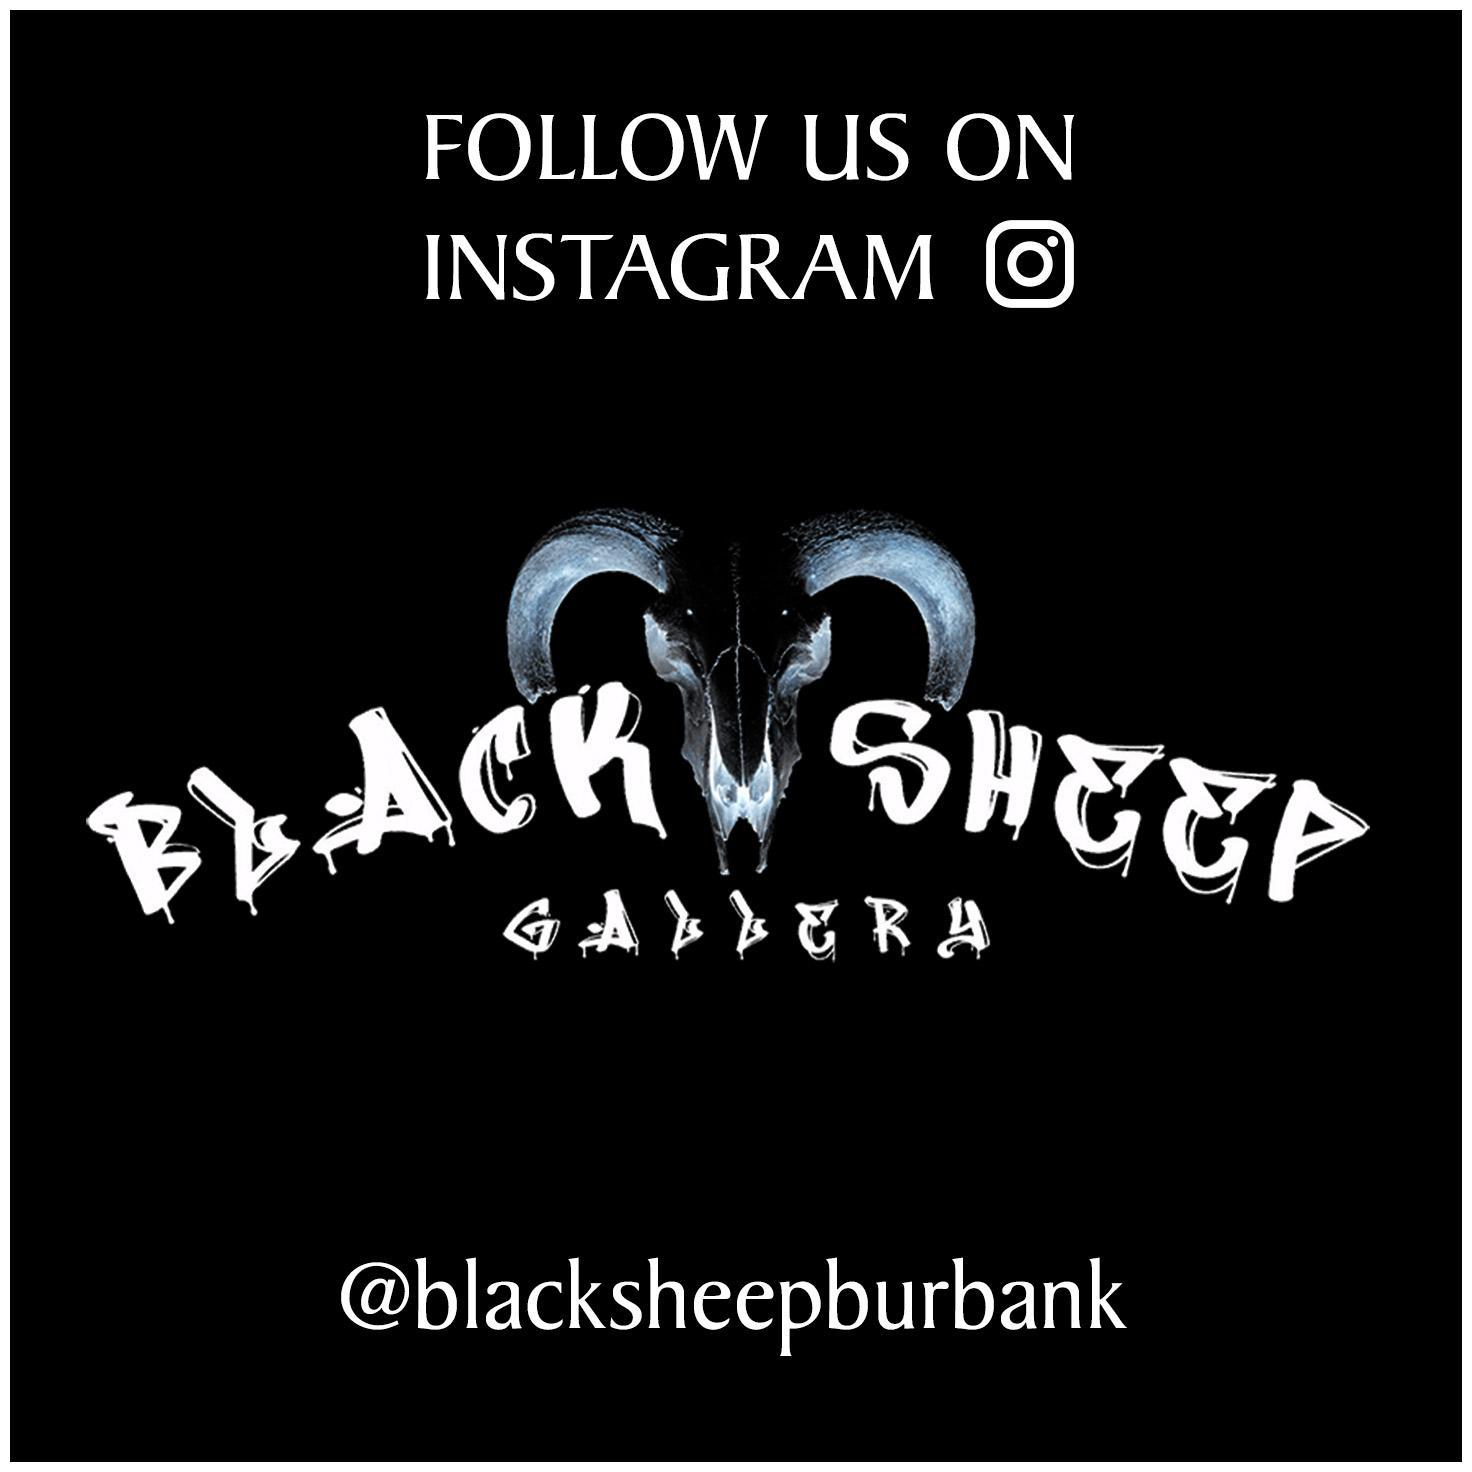 blacksheepinstagram_follow.jpg